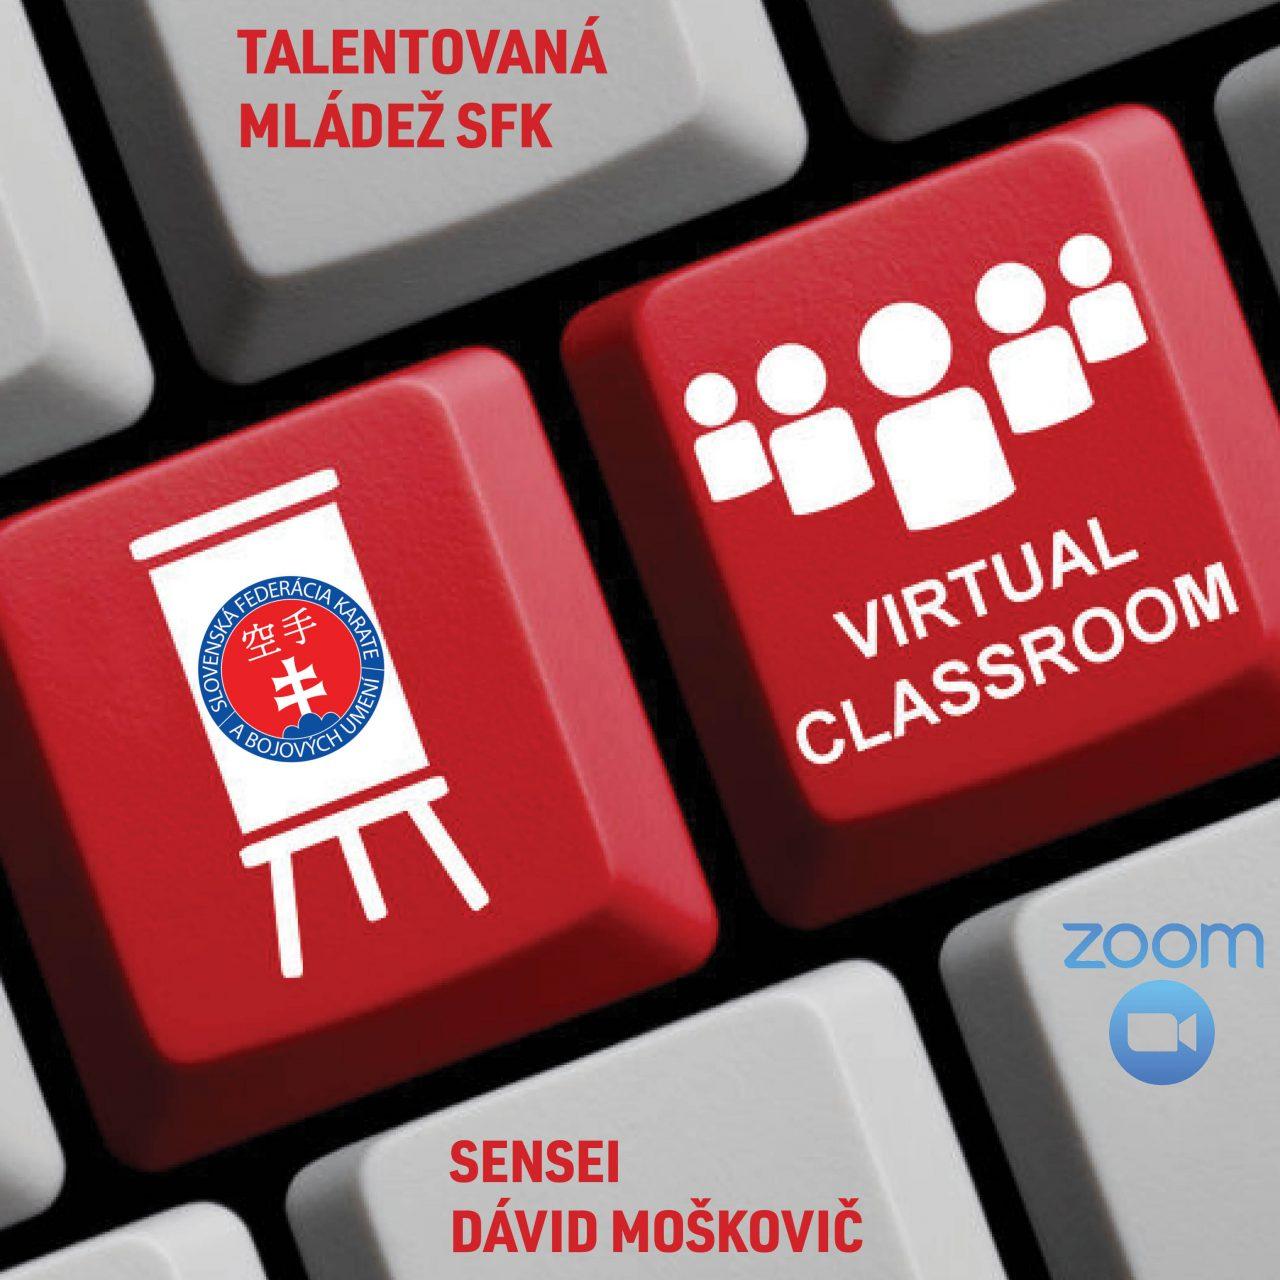 https://karate-slovakia.sk/wp-content/uploads/online-treningy_tm-1280x1280.jpg